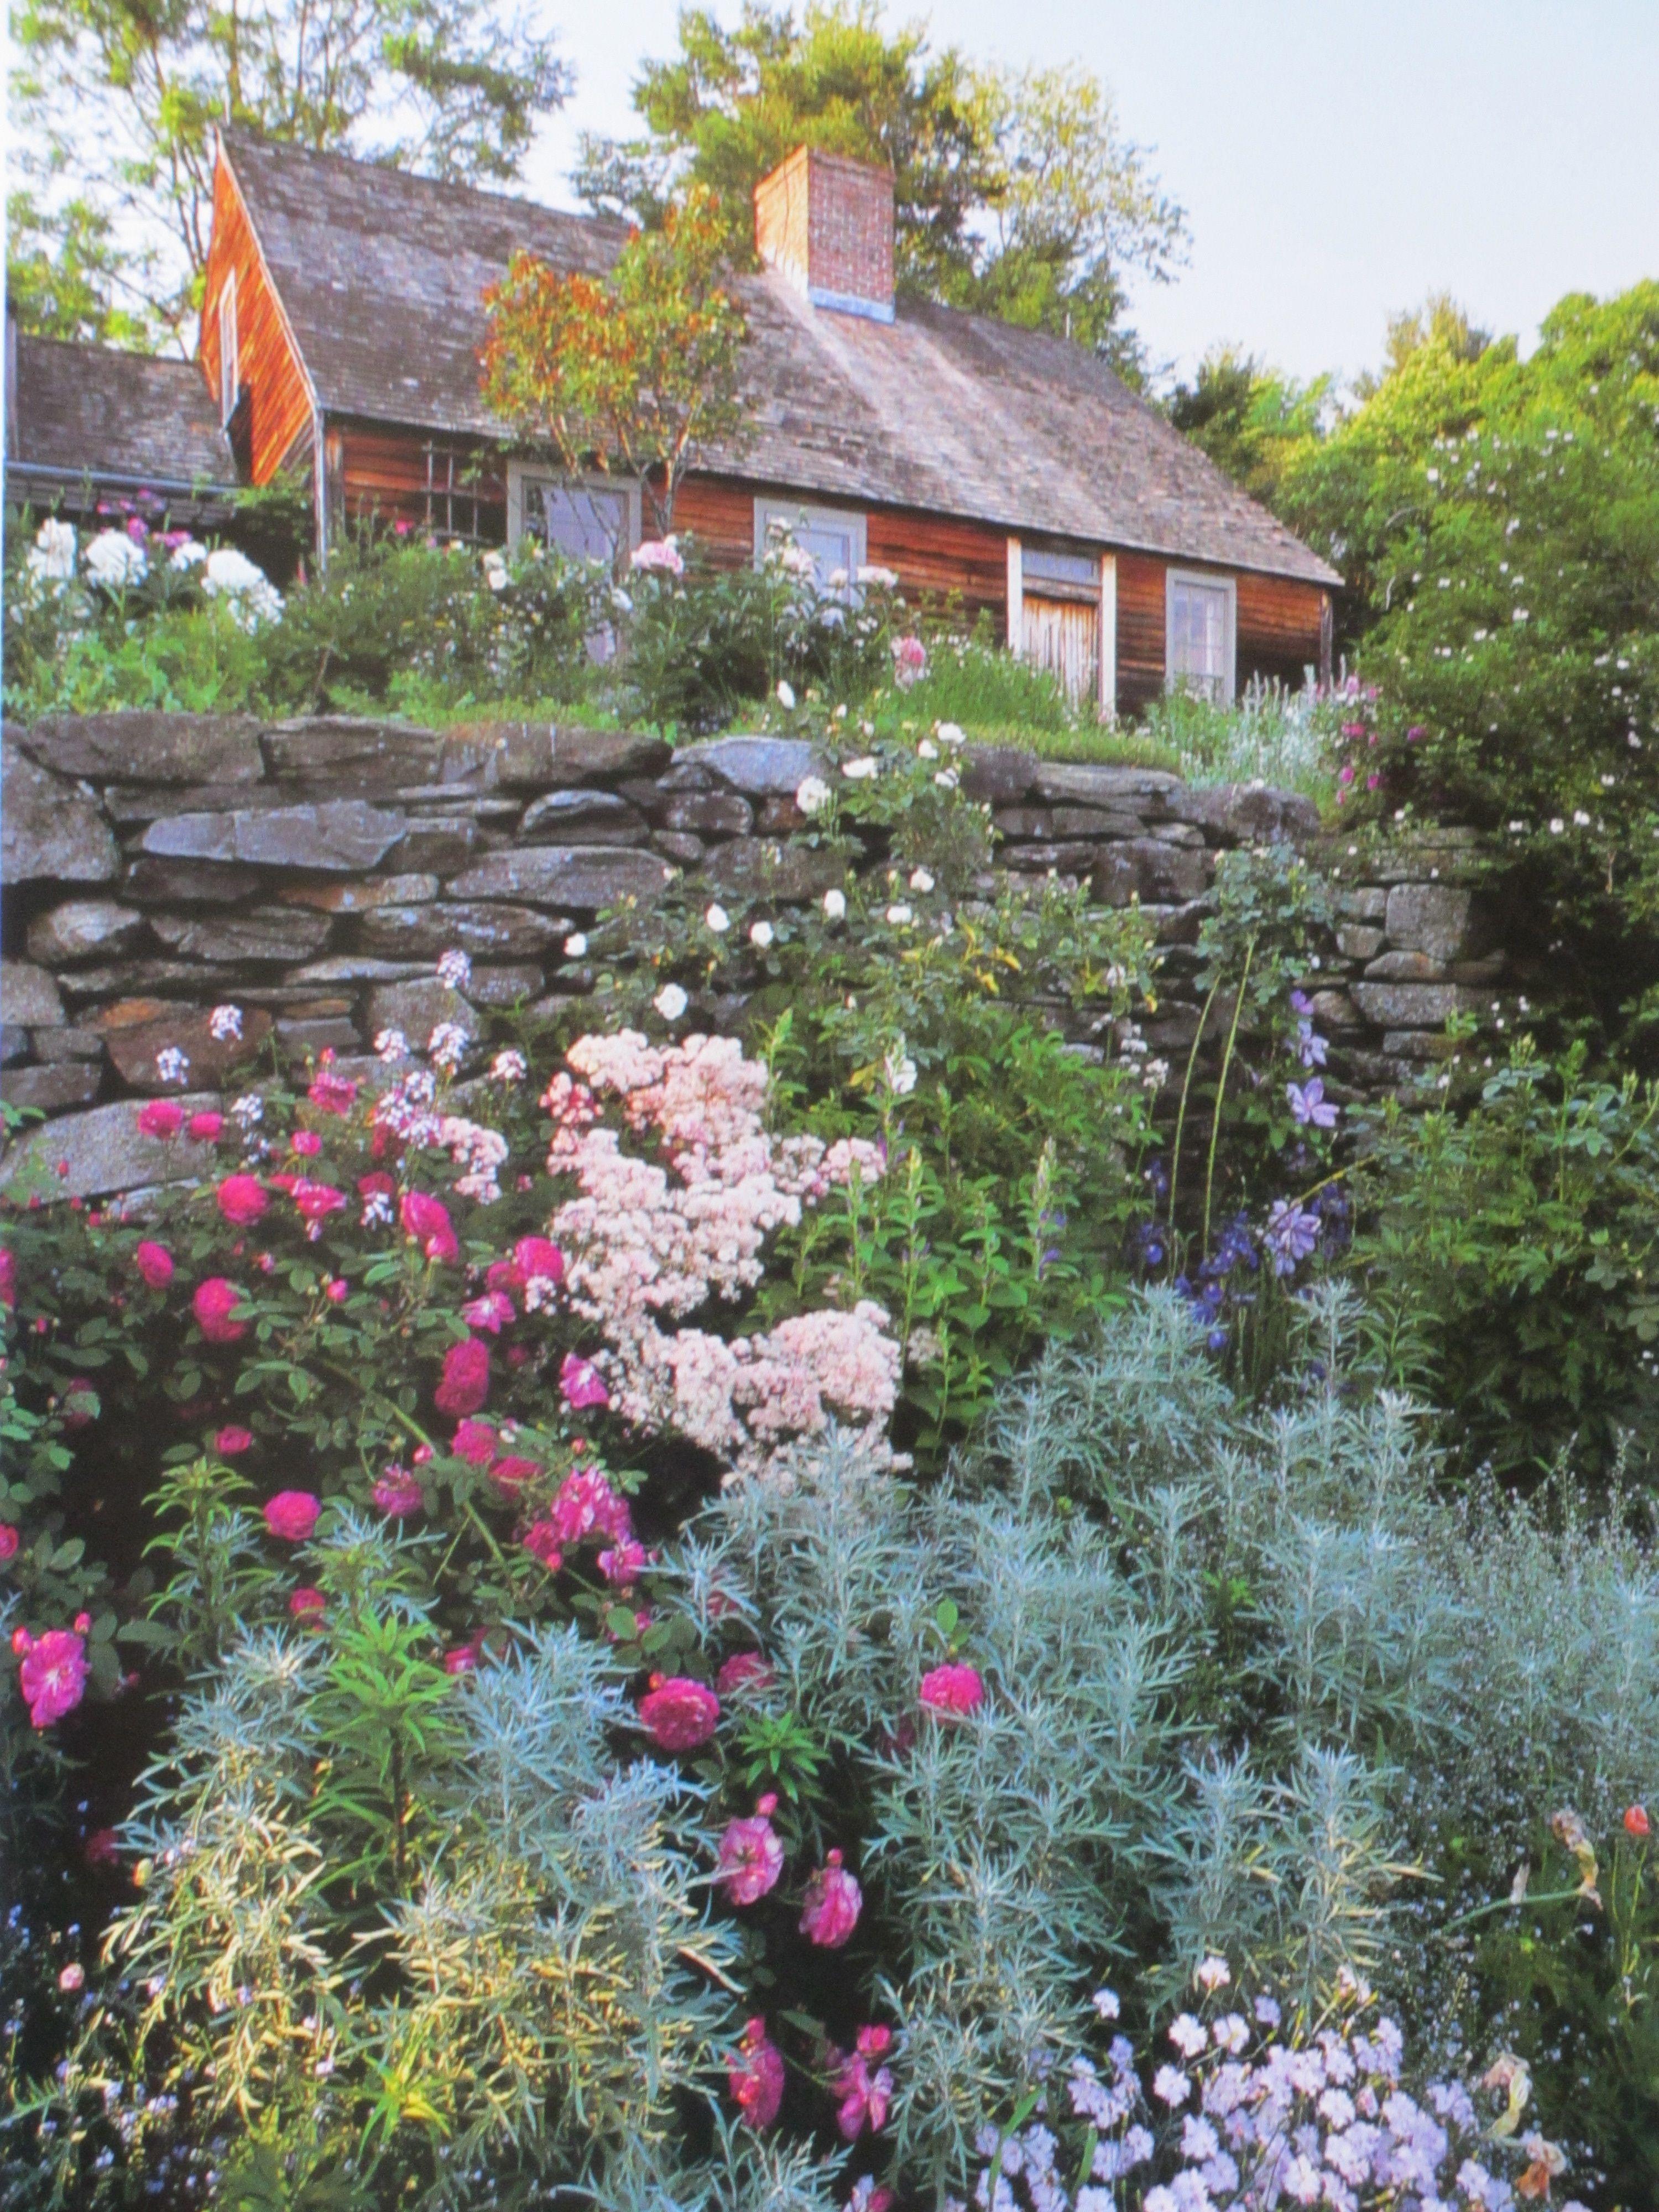 tasha tudor s home surrounded by her gardens